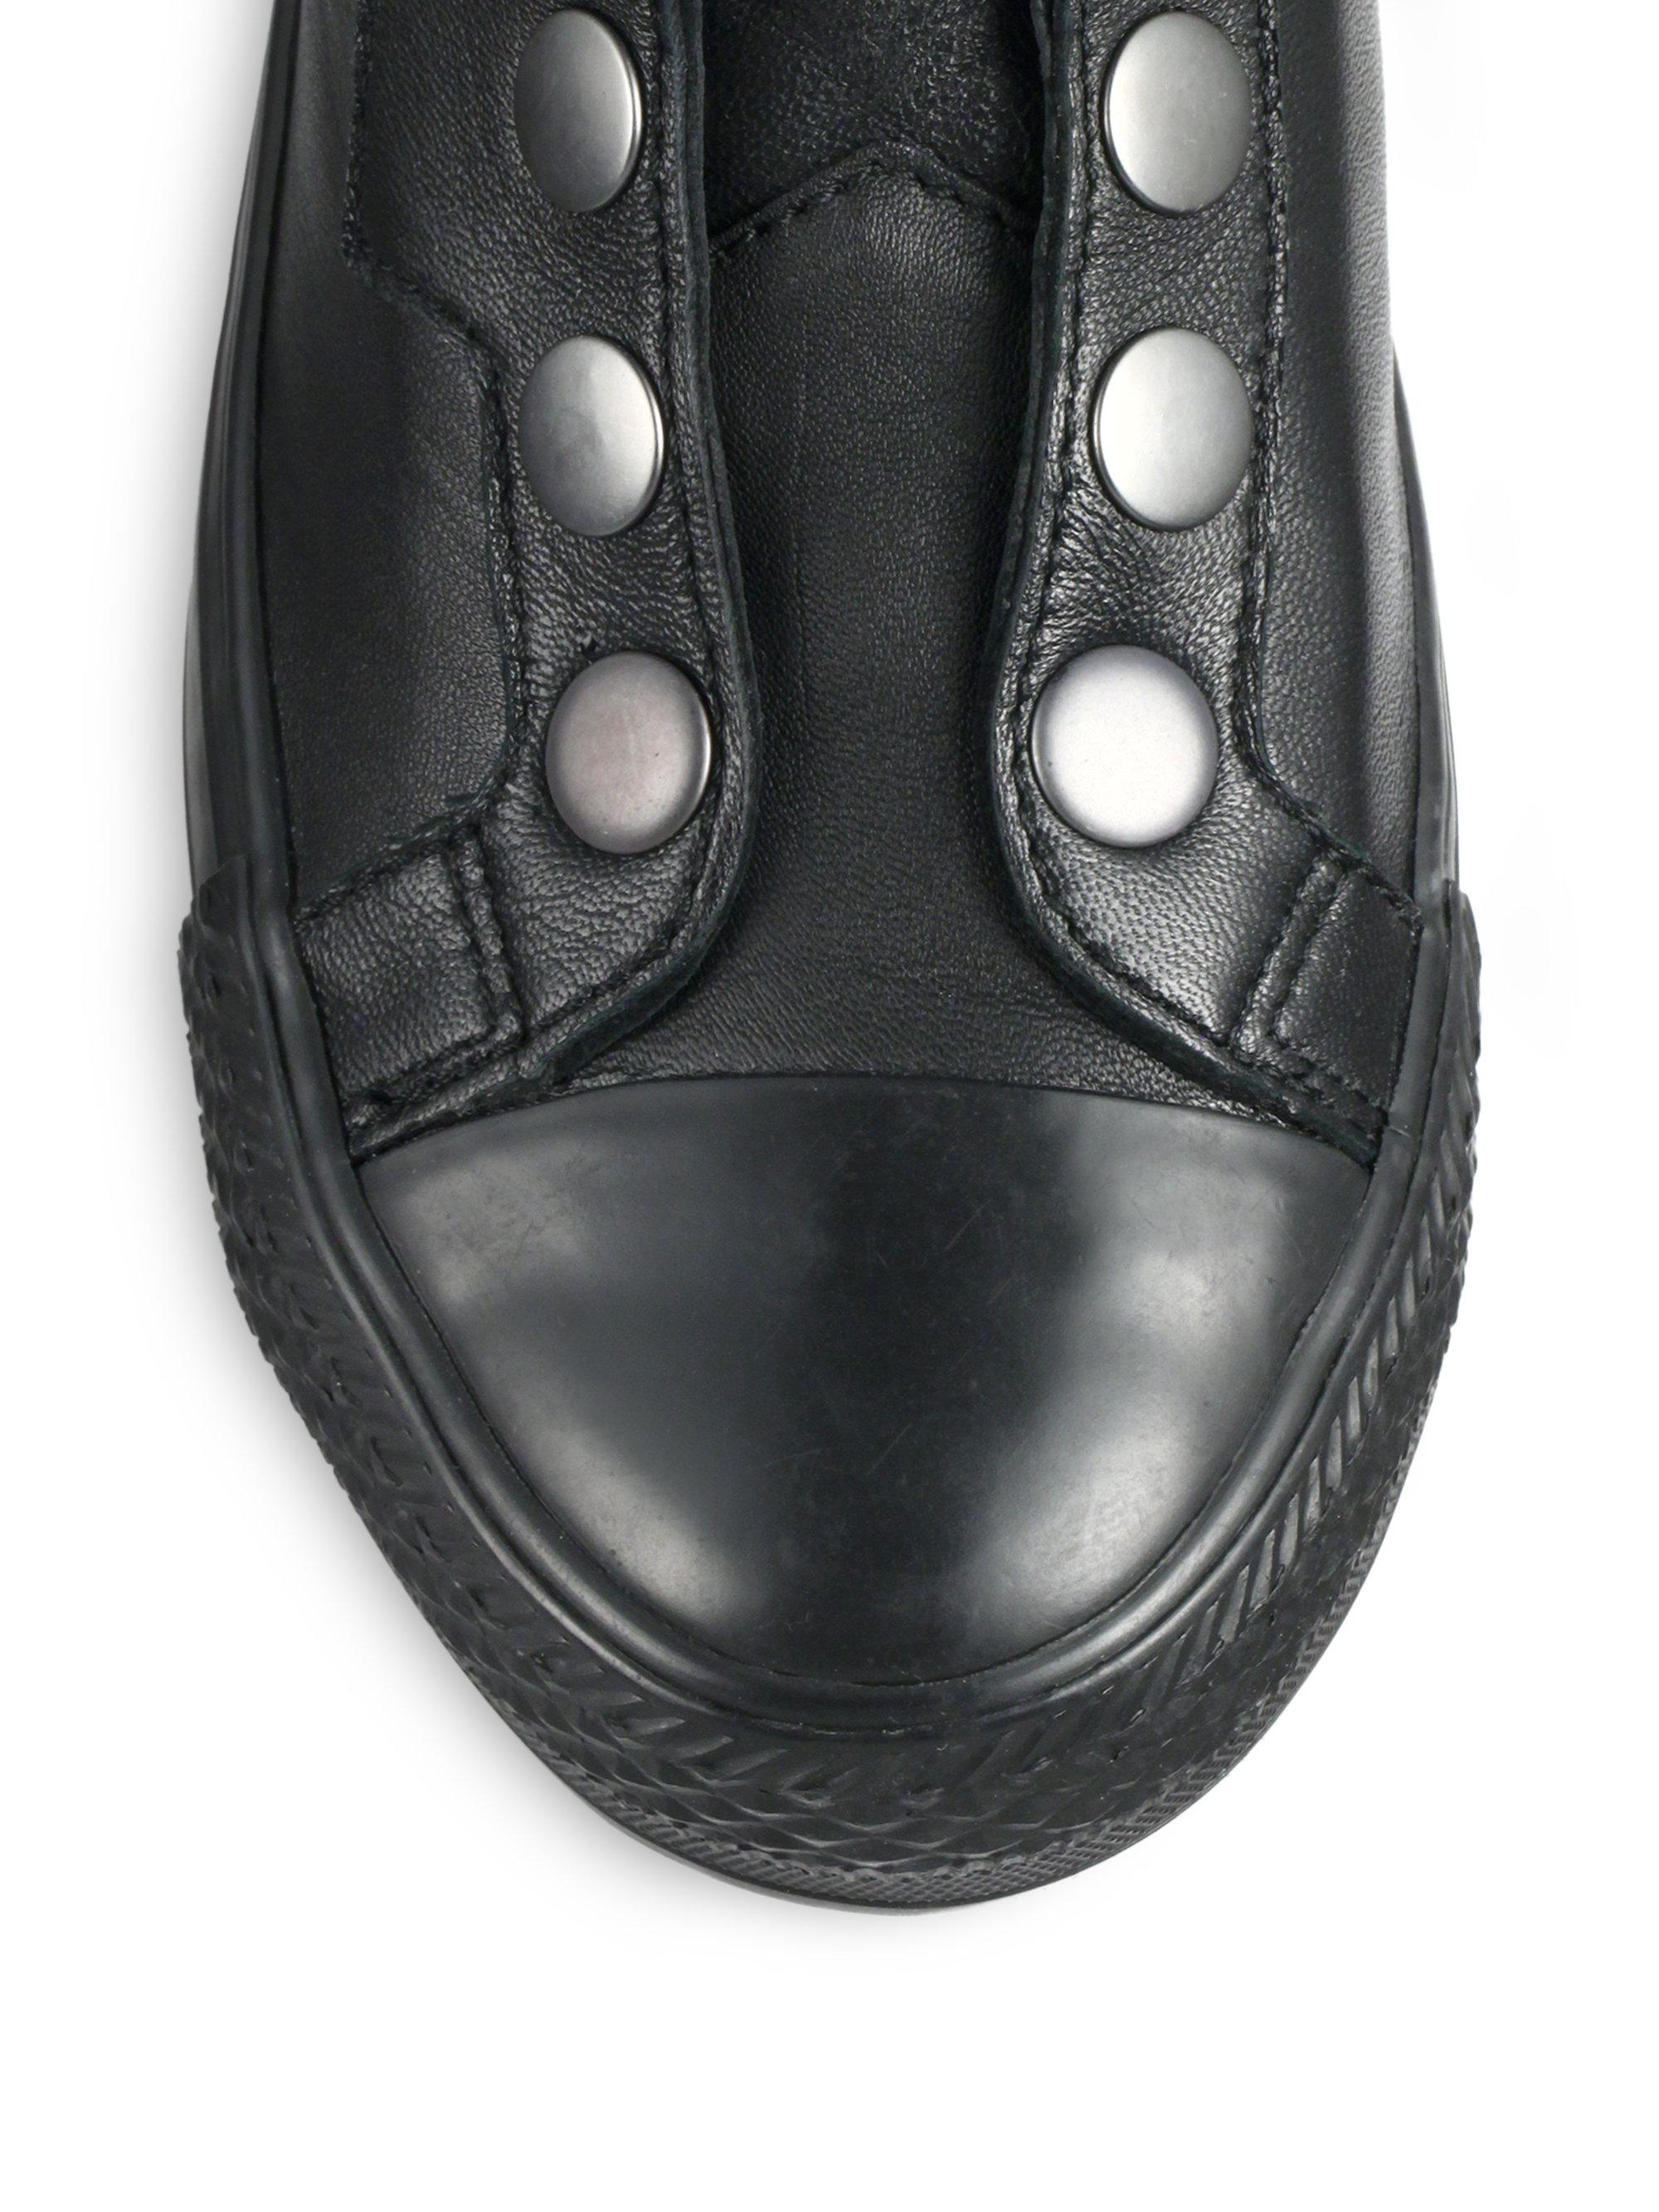 Ash Vespa Leatheramp; High Top Sneaker Black Snaps TFl1JKc3